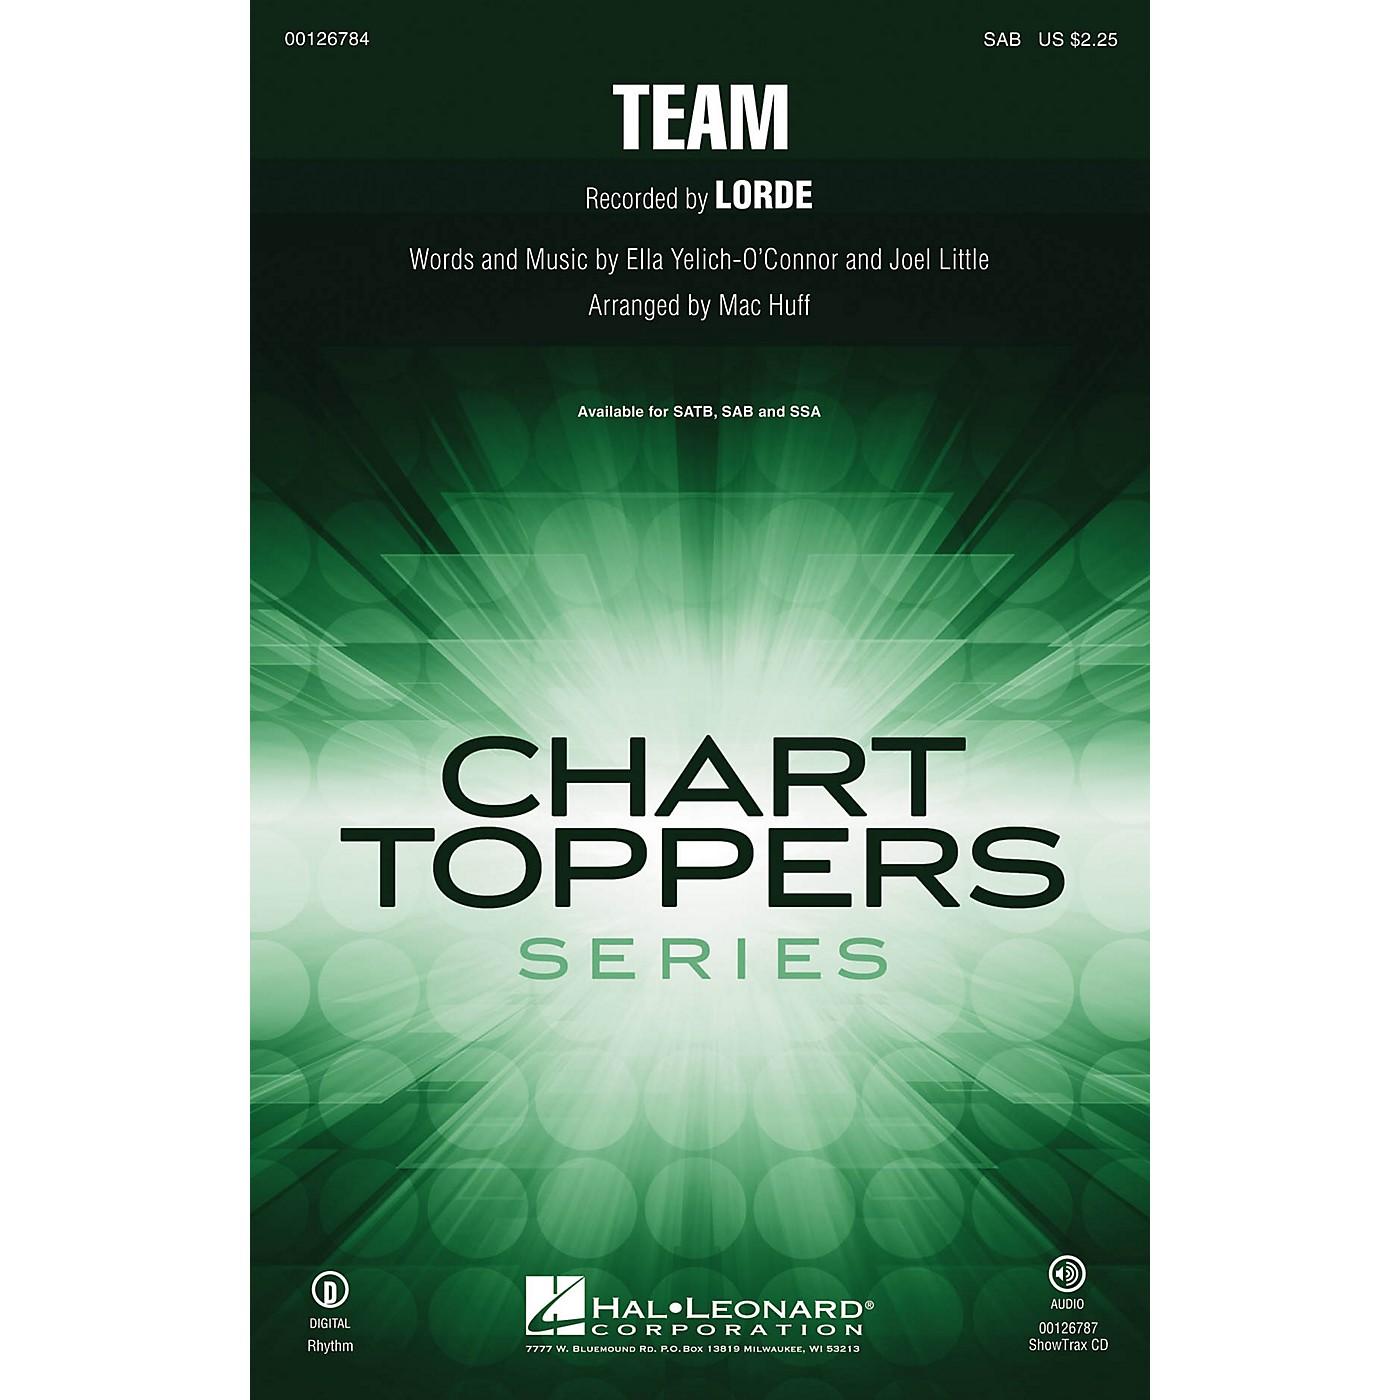 Hal Leonard Team SAB by Lorde arranged by Mac Huff thumbnail